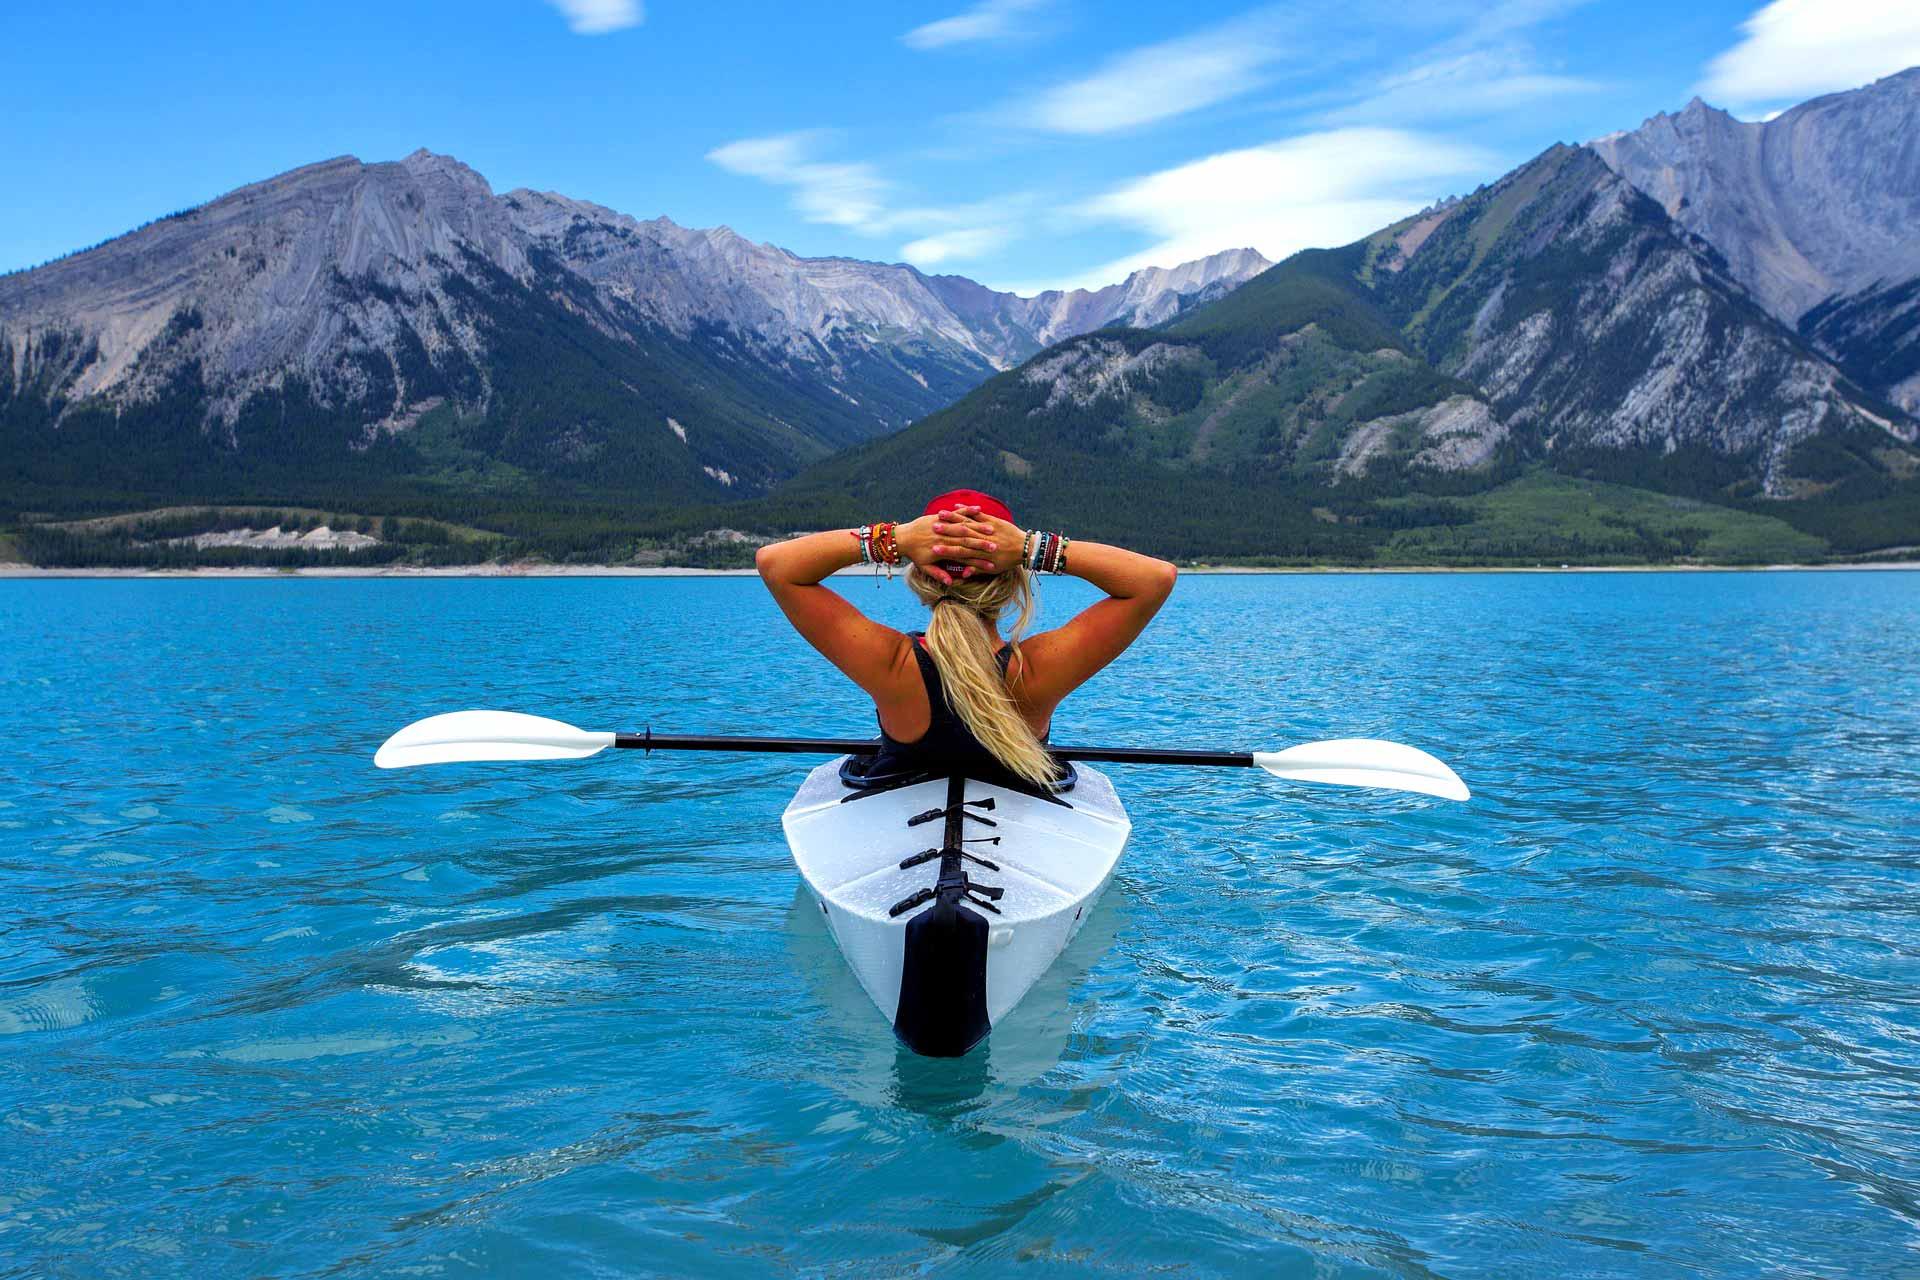 adventure canoe cayak landscape mountains traveller travel tourism